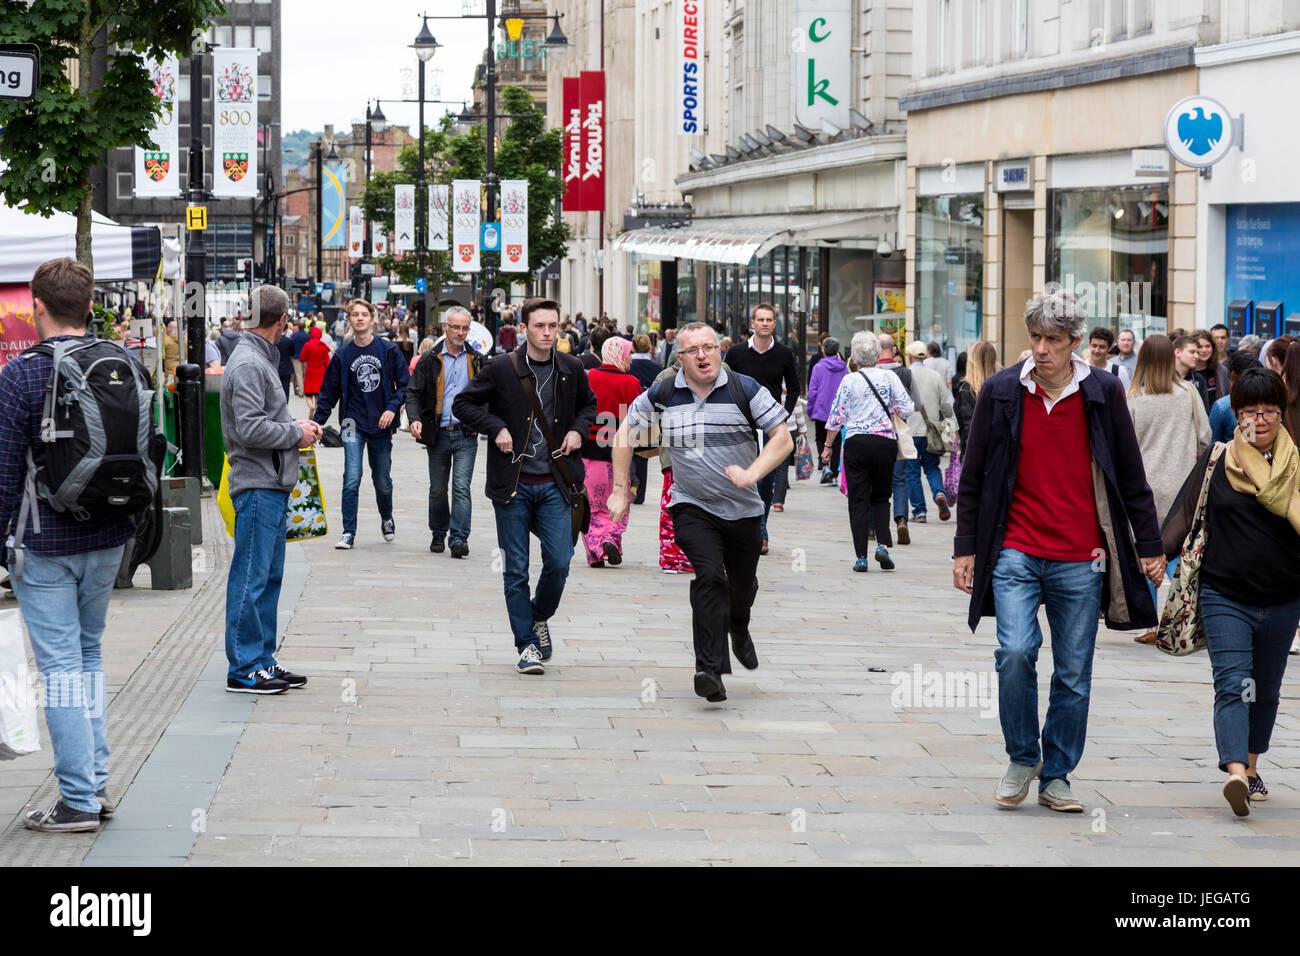 Newcastle-upon-Tyne, England, UK.  Northumberland Street Scene, Pedestrians Walking, Shops. - Stock Image